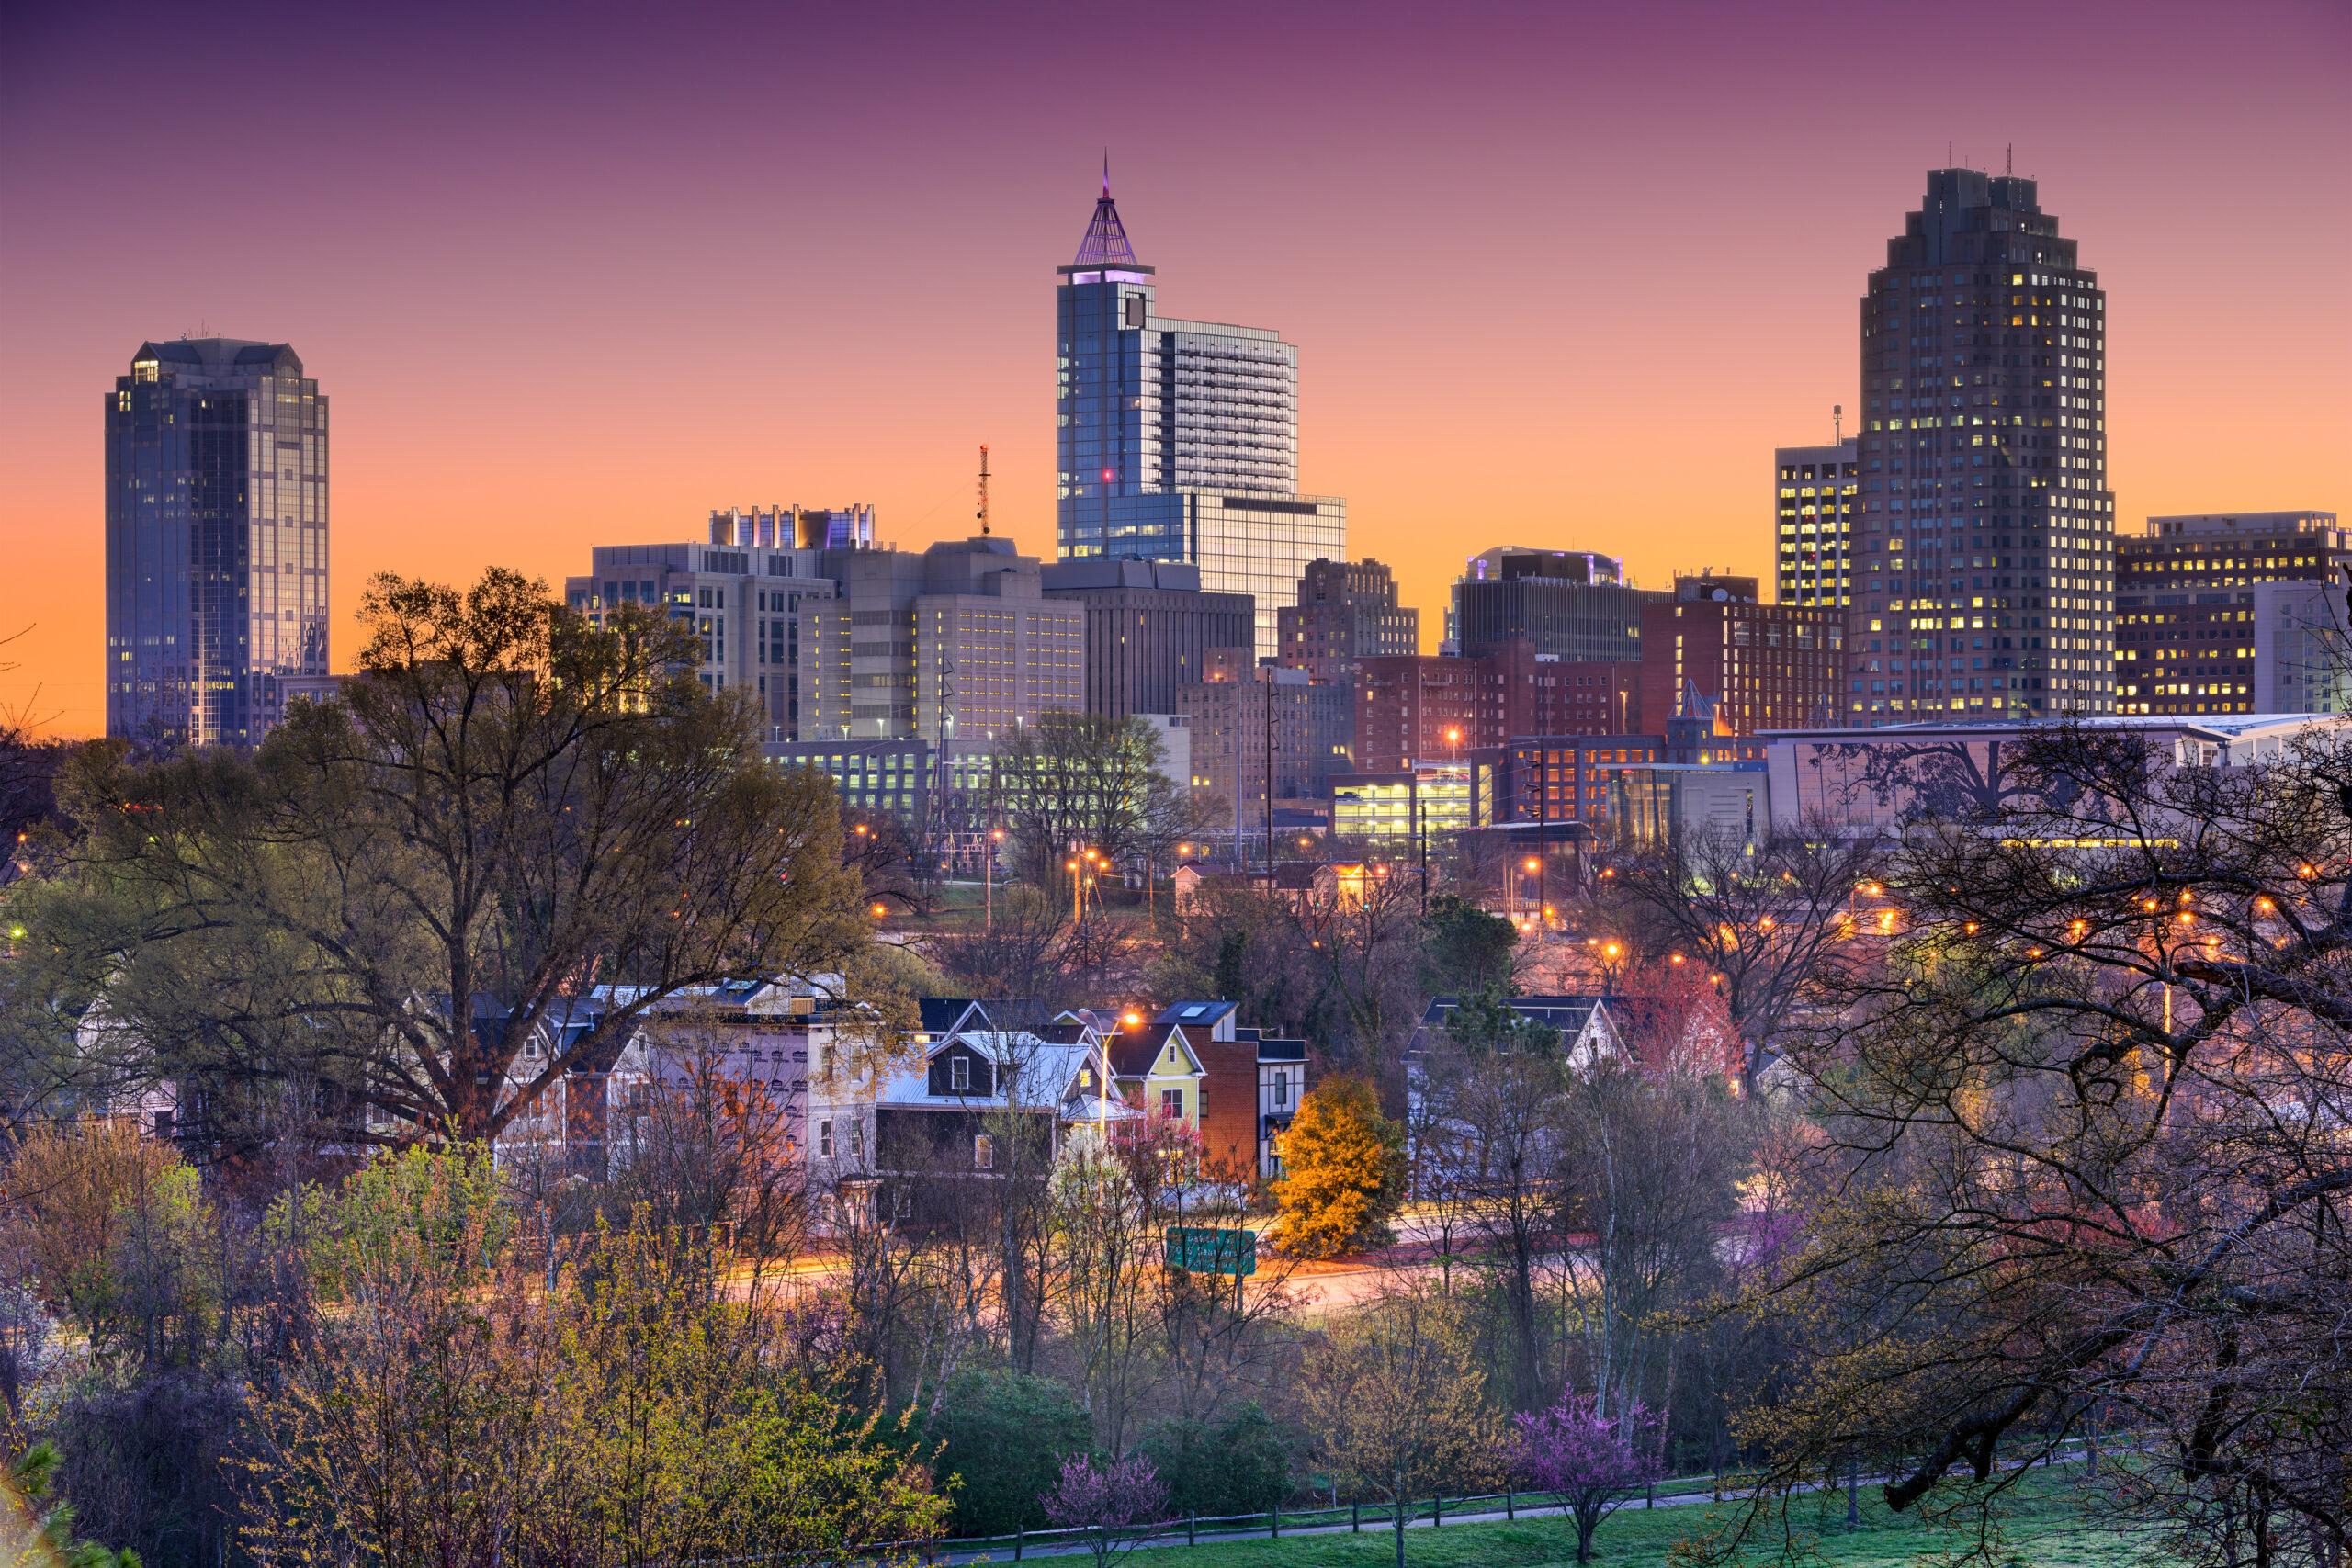 Raleigh, North Carolina skyline.